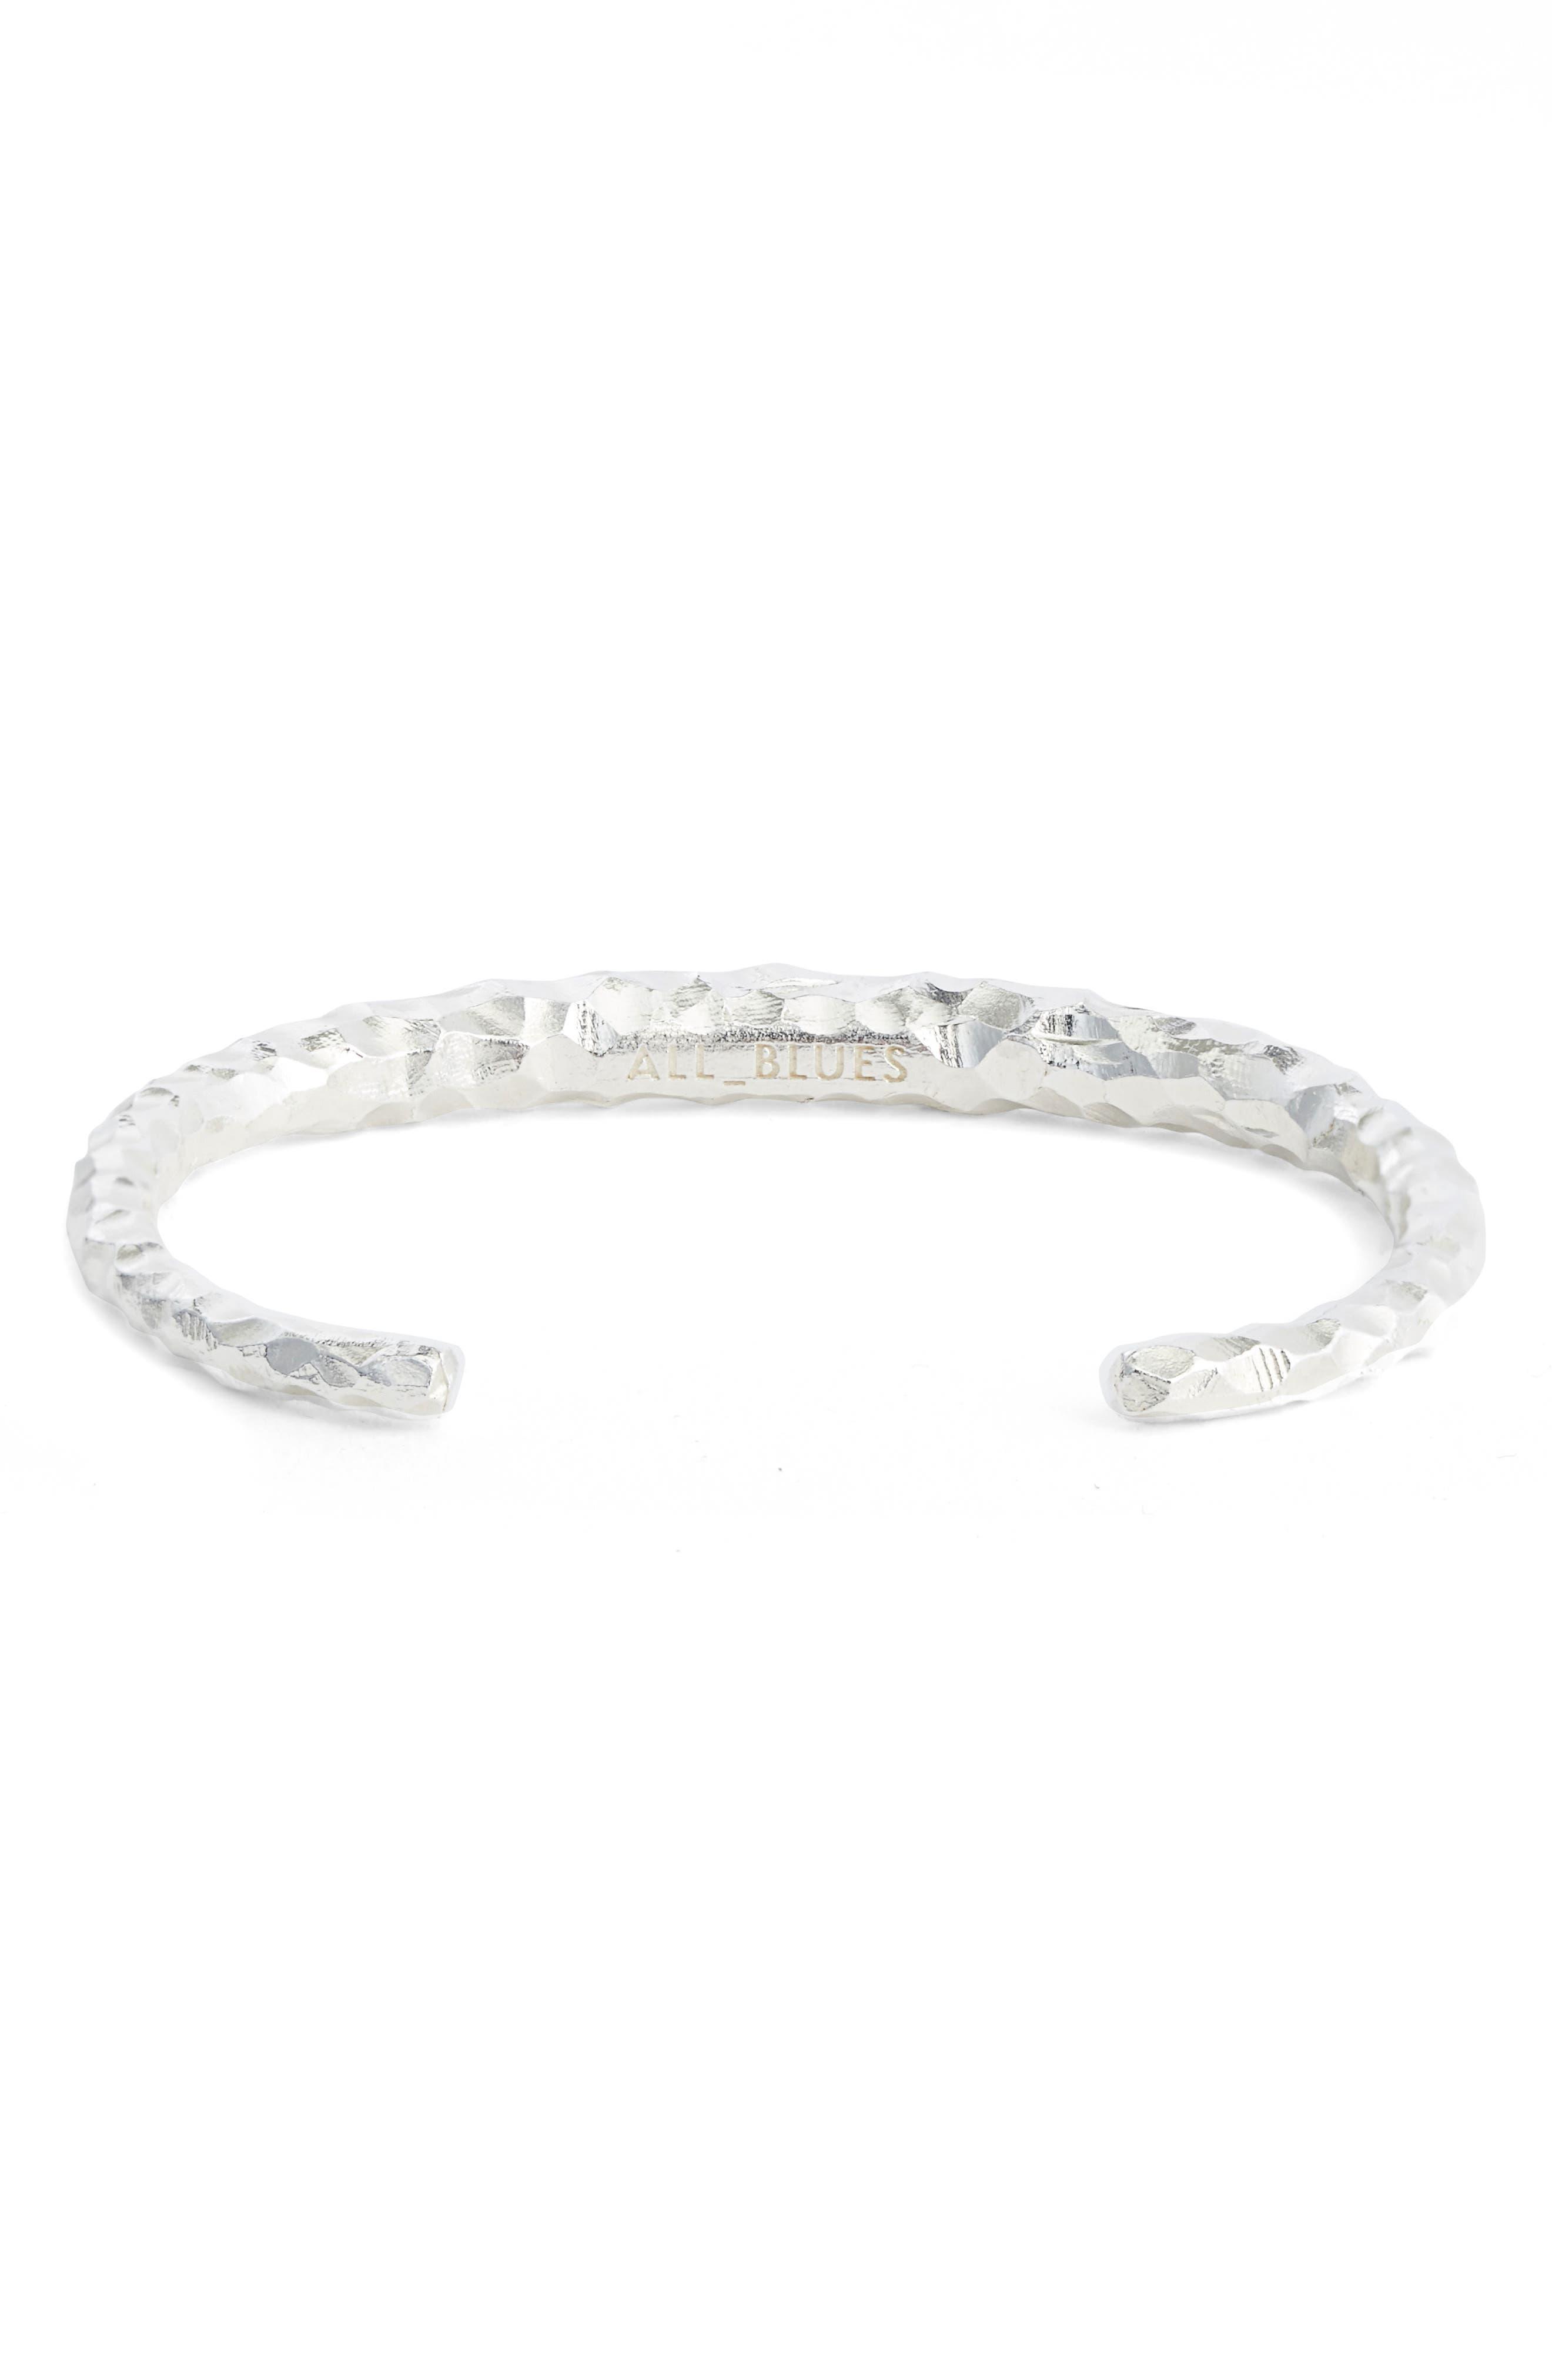 Large Snake Carved Silver Bracelet,                             Main thumbnail 1, color,                             CARVED SILVER